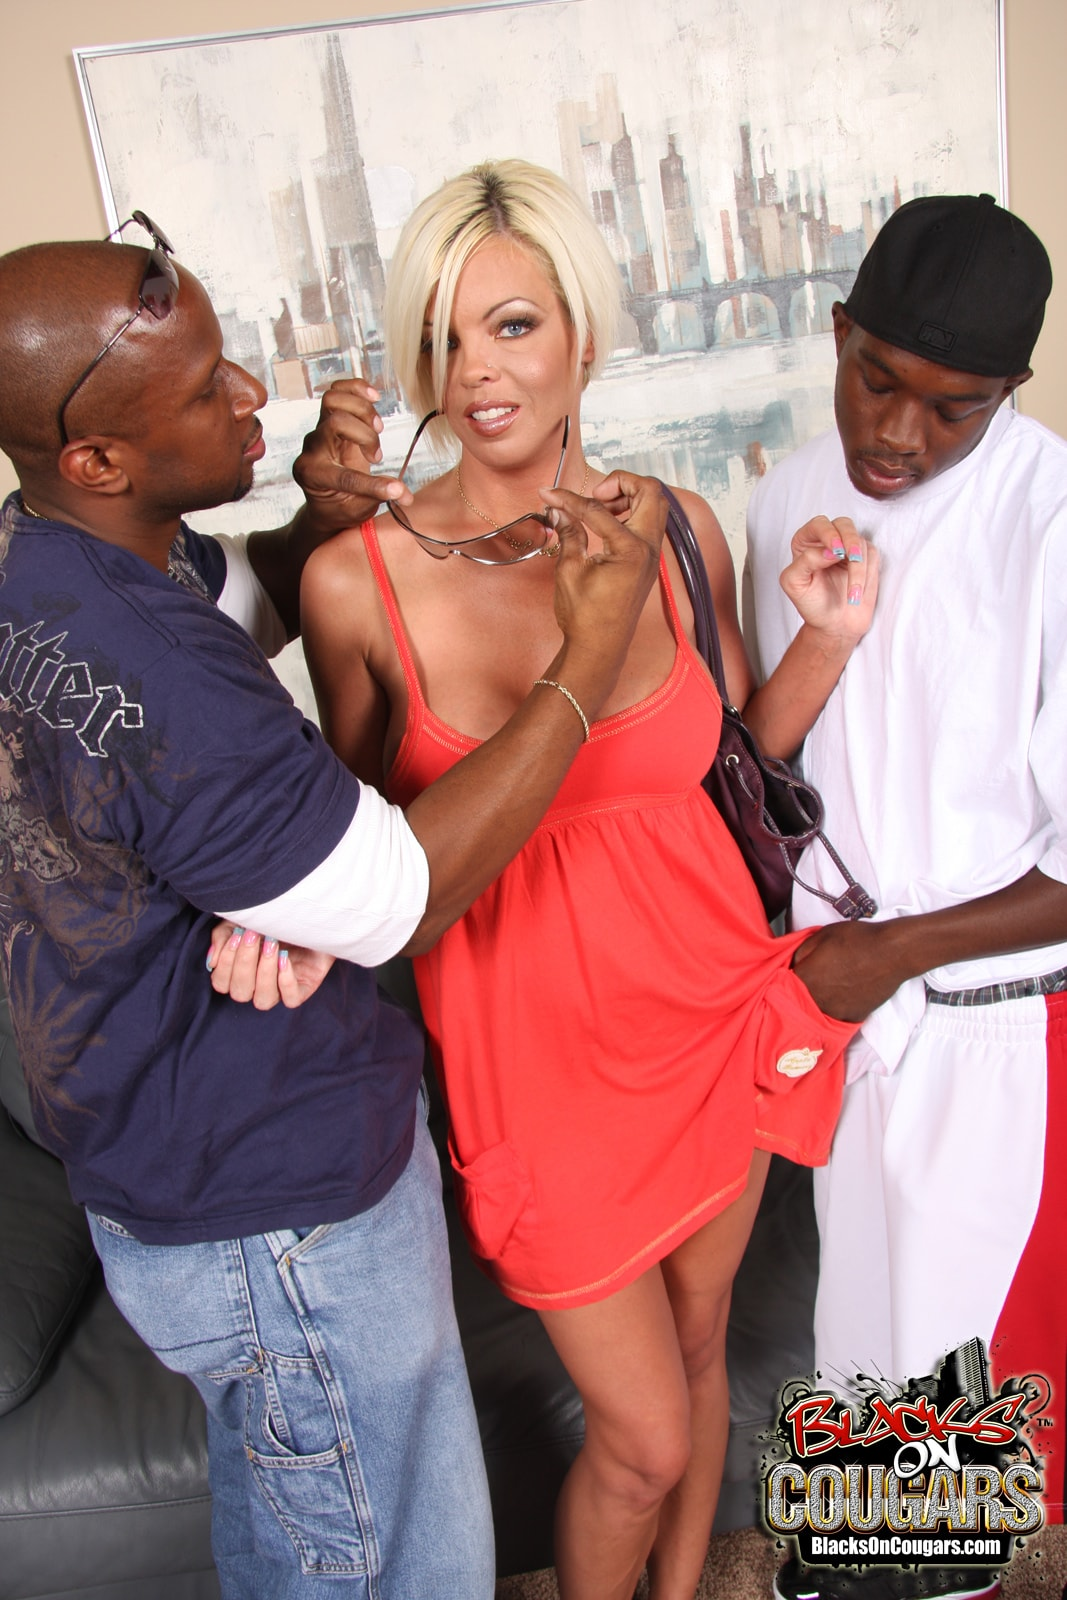 Dogfart '- Blacks On Cougars' starring Jordan Blue (Photo 7)